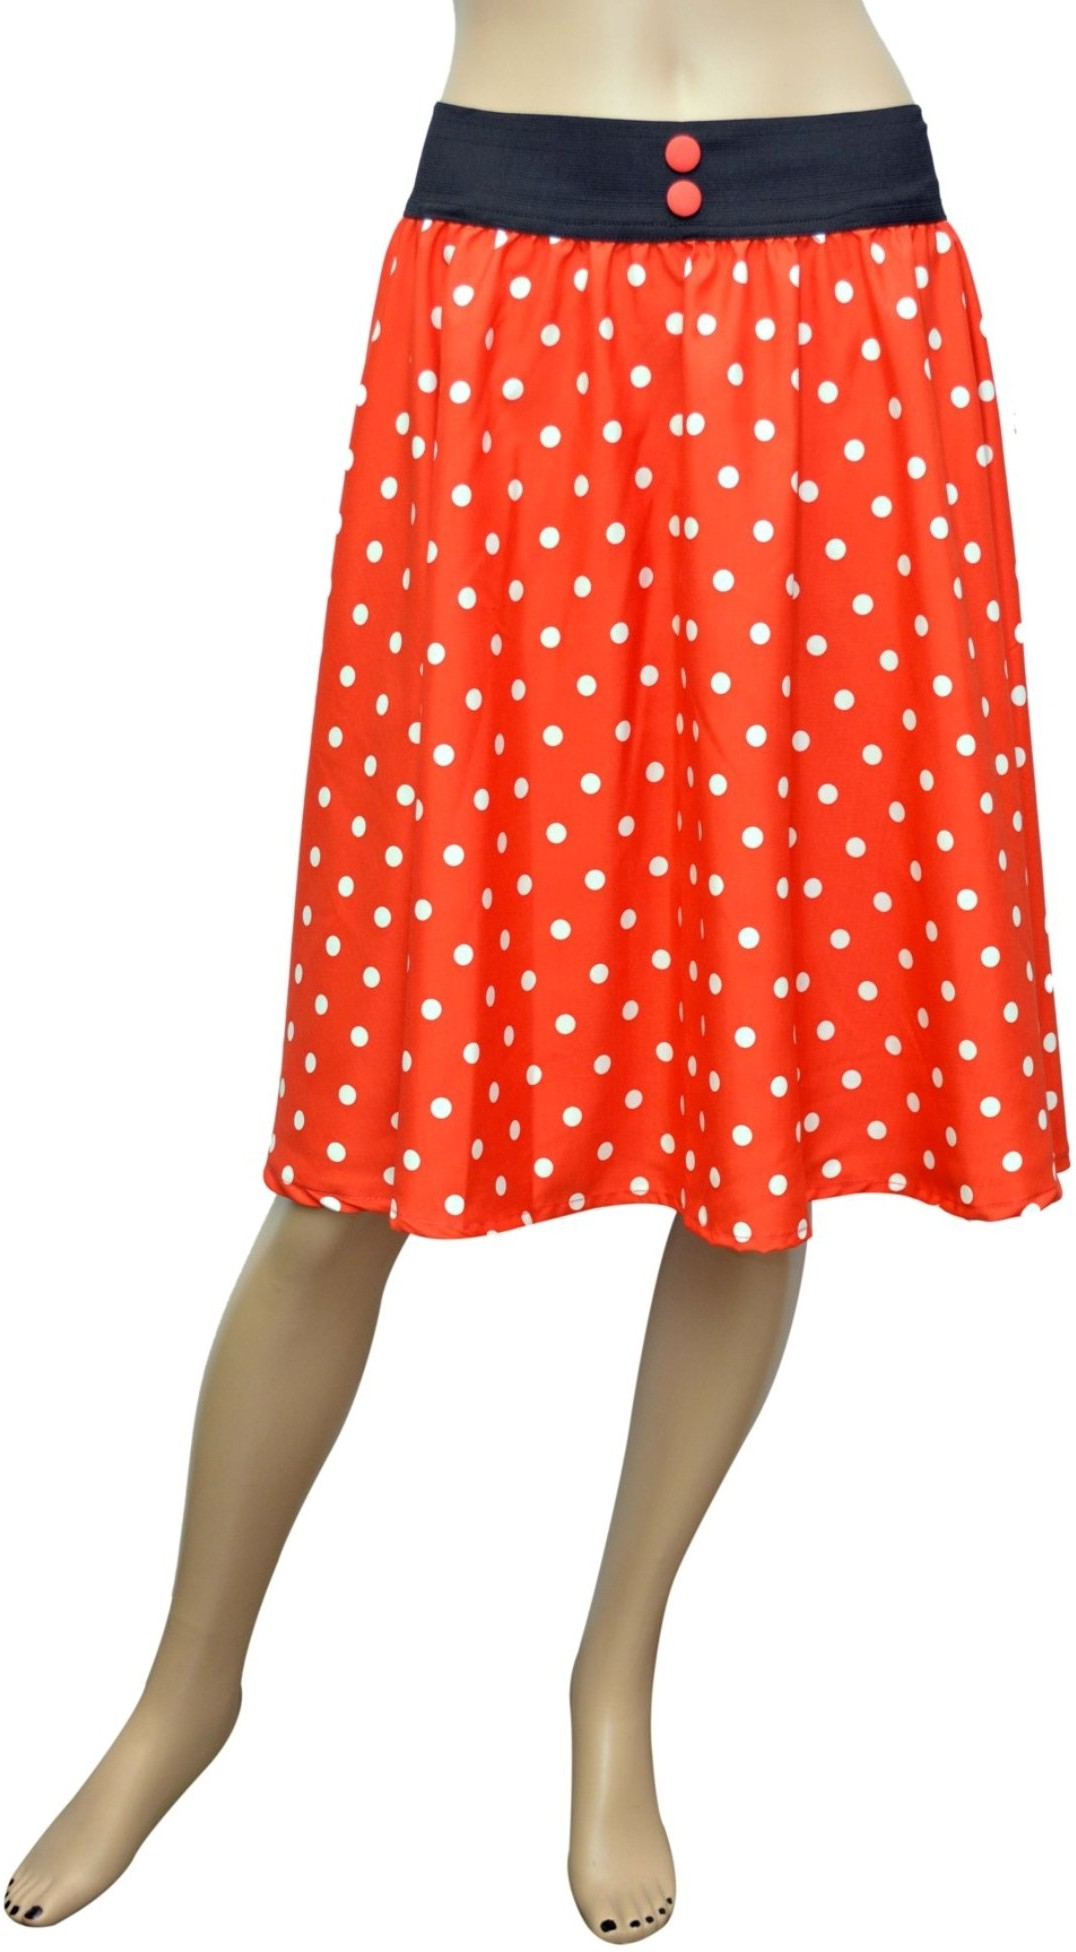 GraceDiva Polka Print Womens Pleated Orange, White Skirt